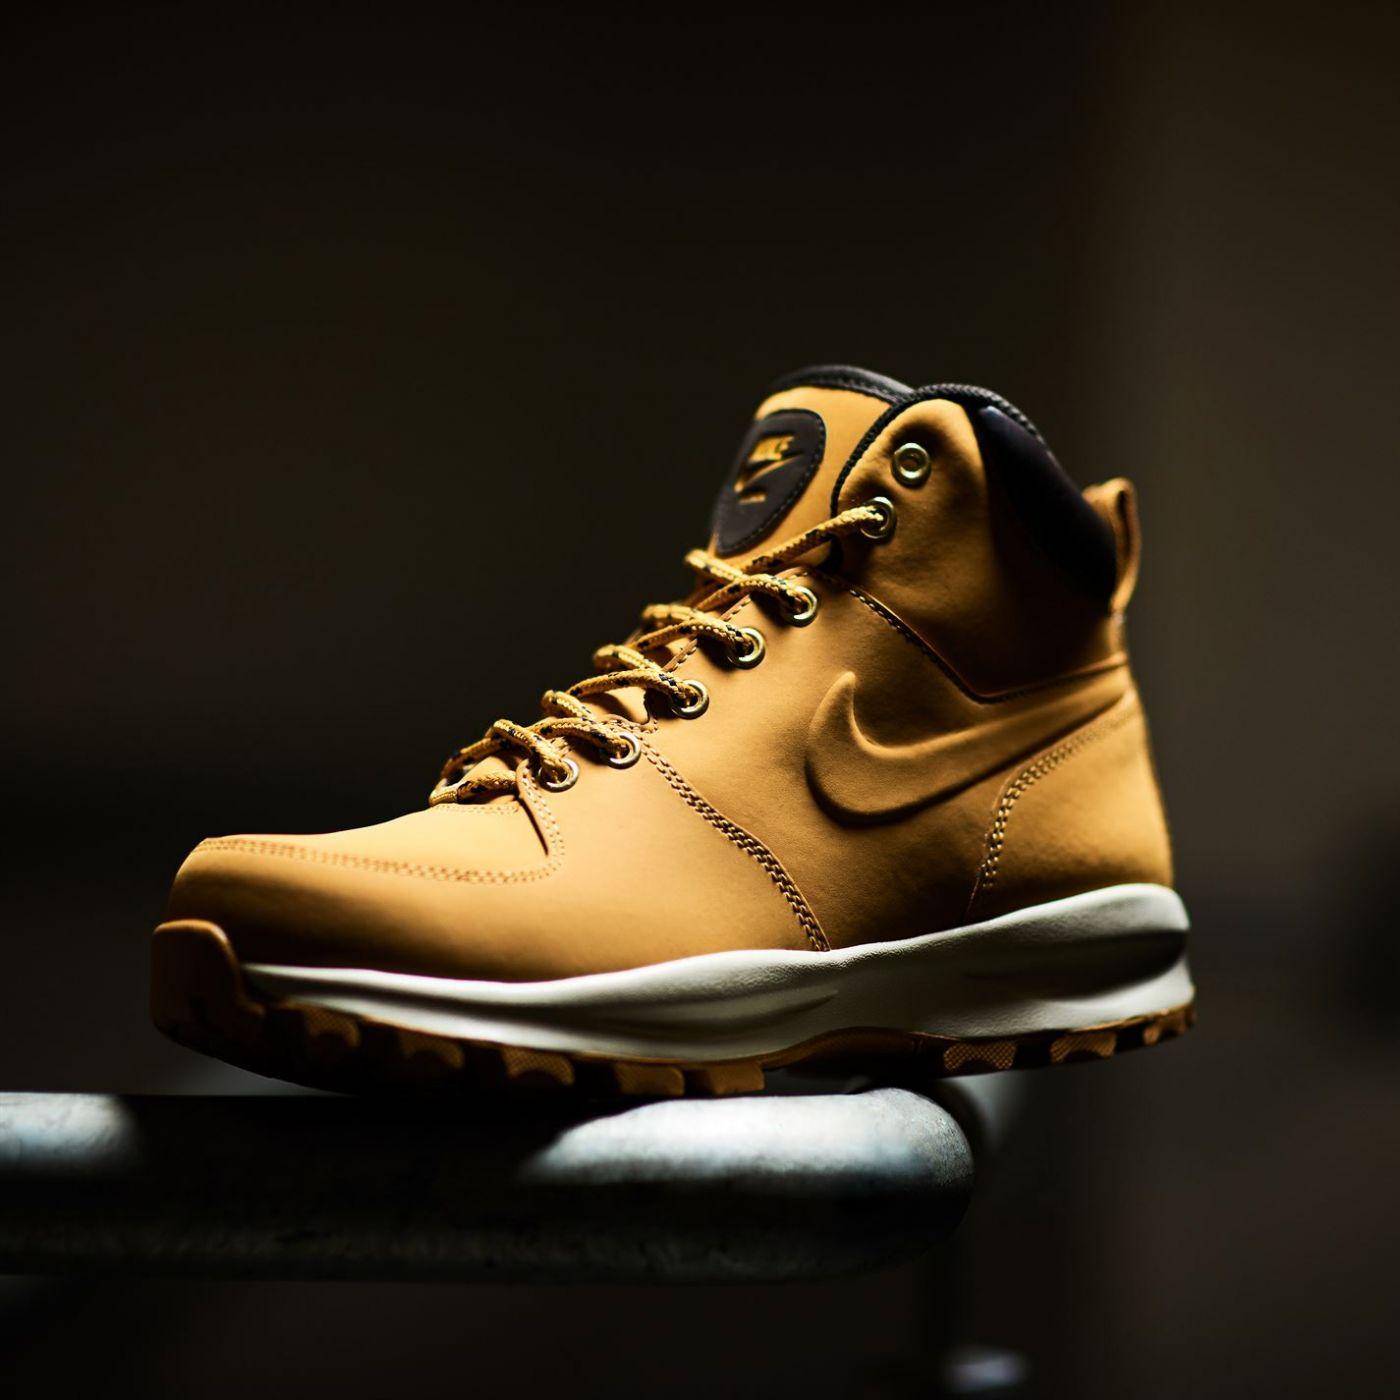 Nike Manoa Leather Mens Boots